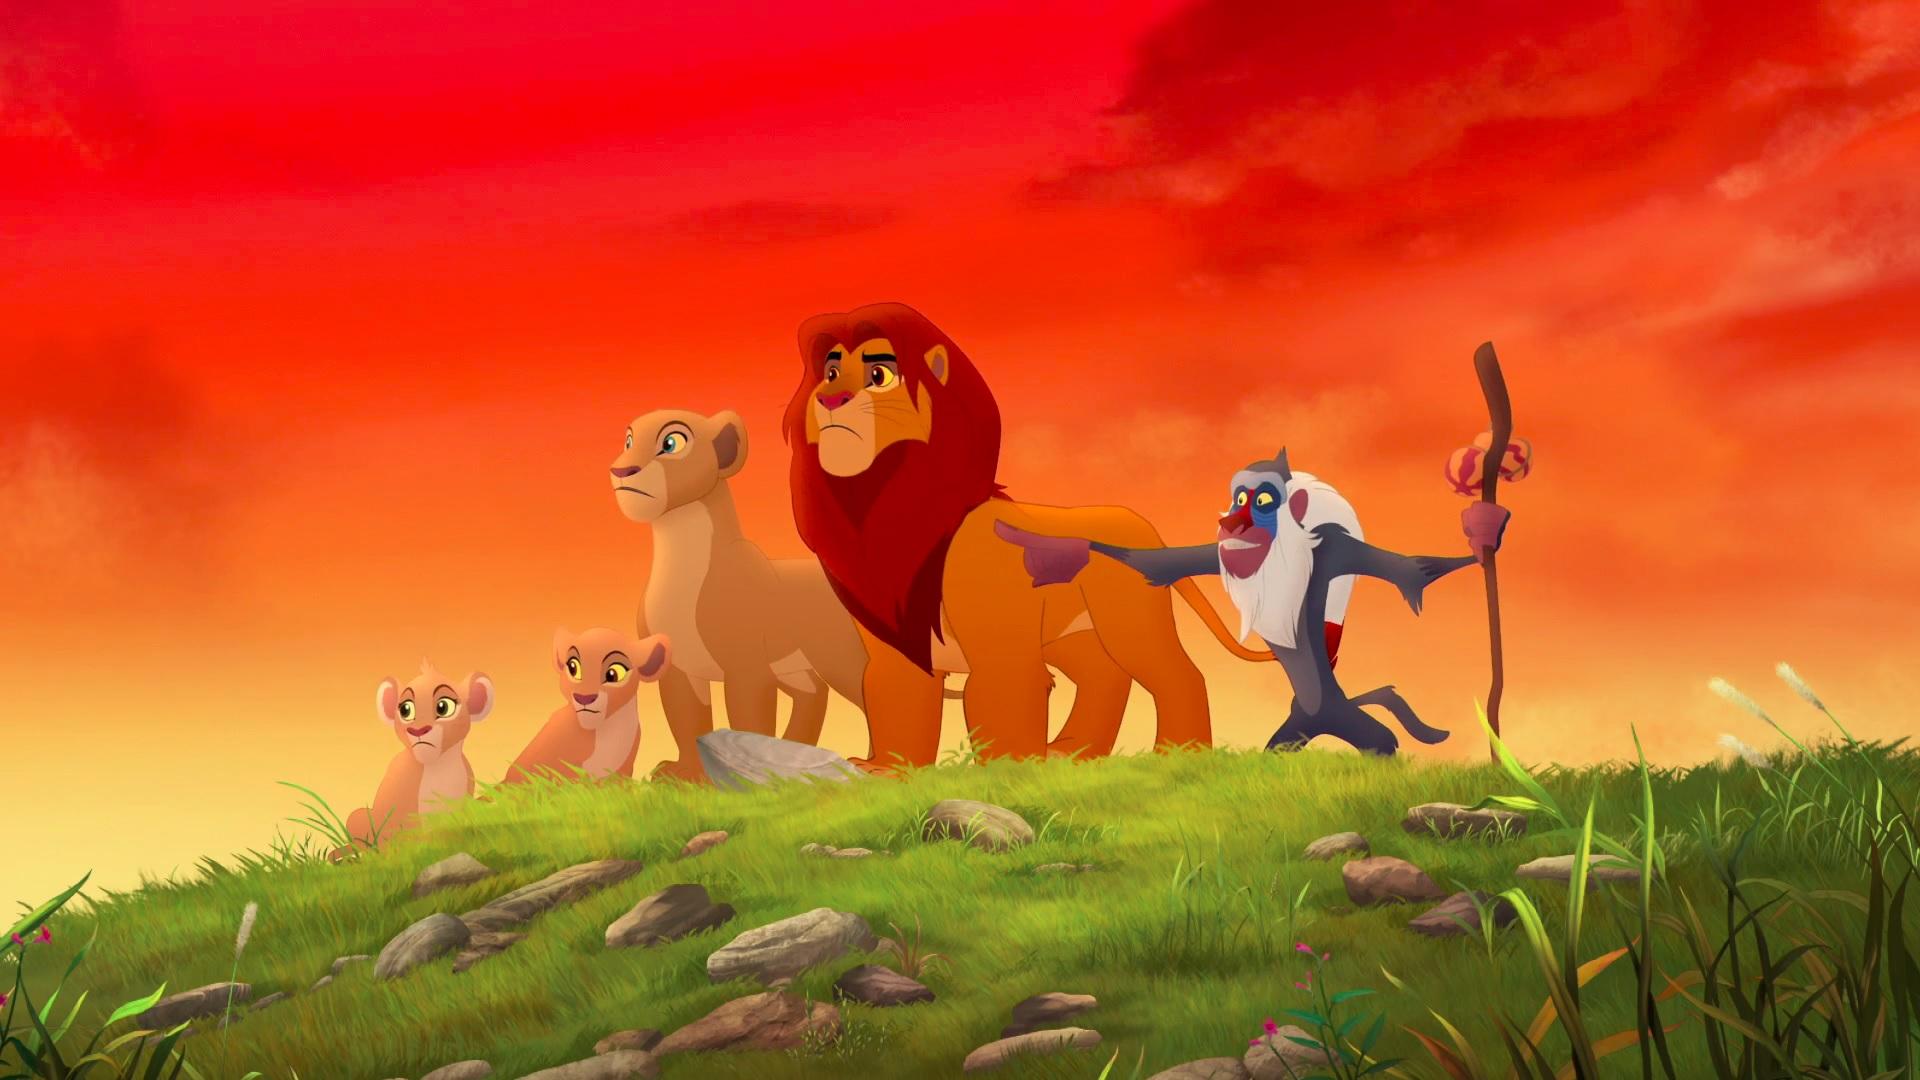 Simba Nala Kiara Tiifu Аnd Rafiki Lion Guard Hd Wallpaper - Lion Guard Return Of The Roar 2015 , HD Wallpaper & Backgrounds